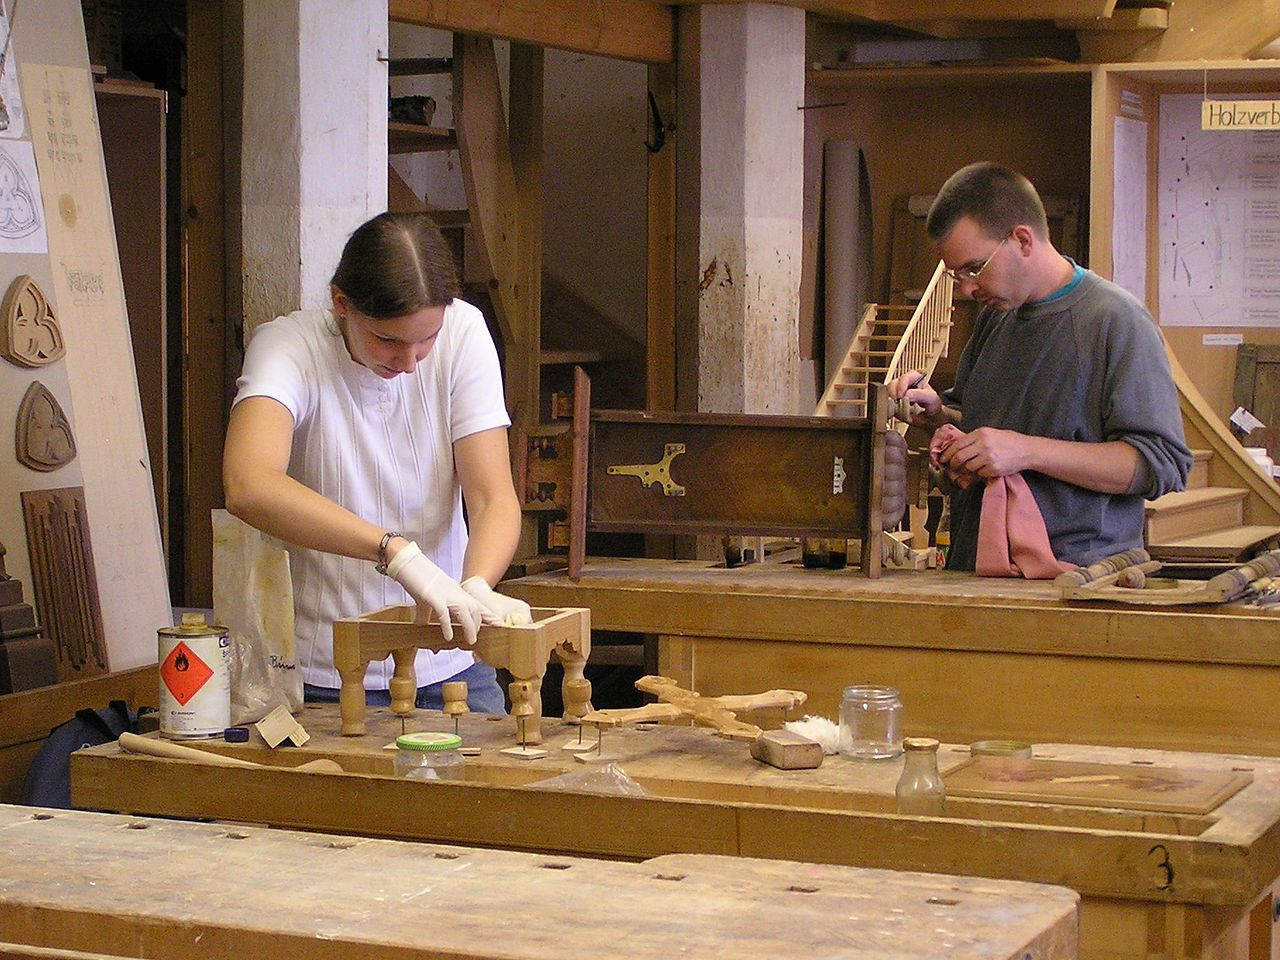 Holz Handwerk Nürnberg 2019  Datei Restauratoren im Handwerk Holz –